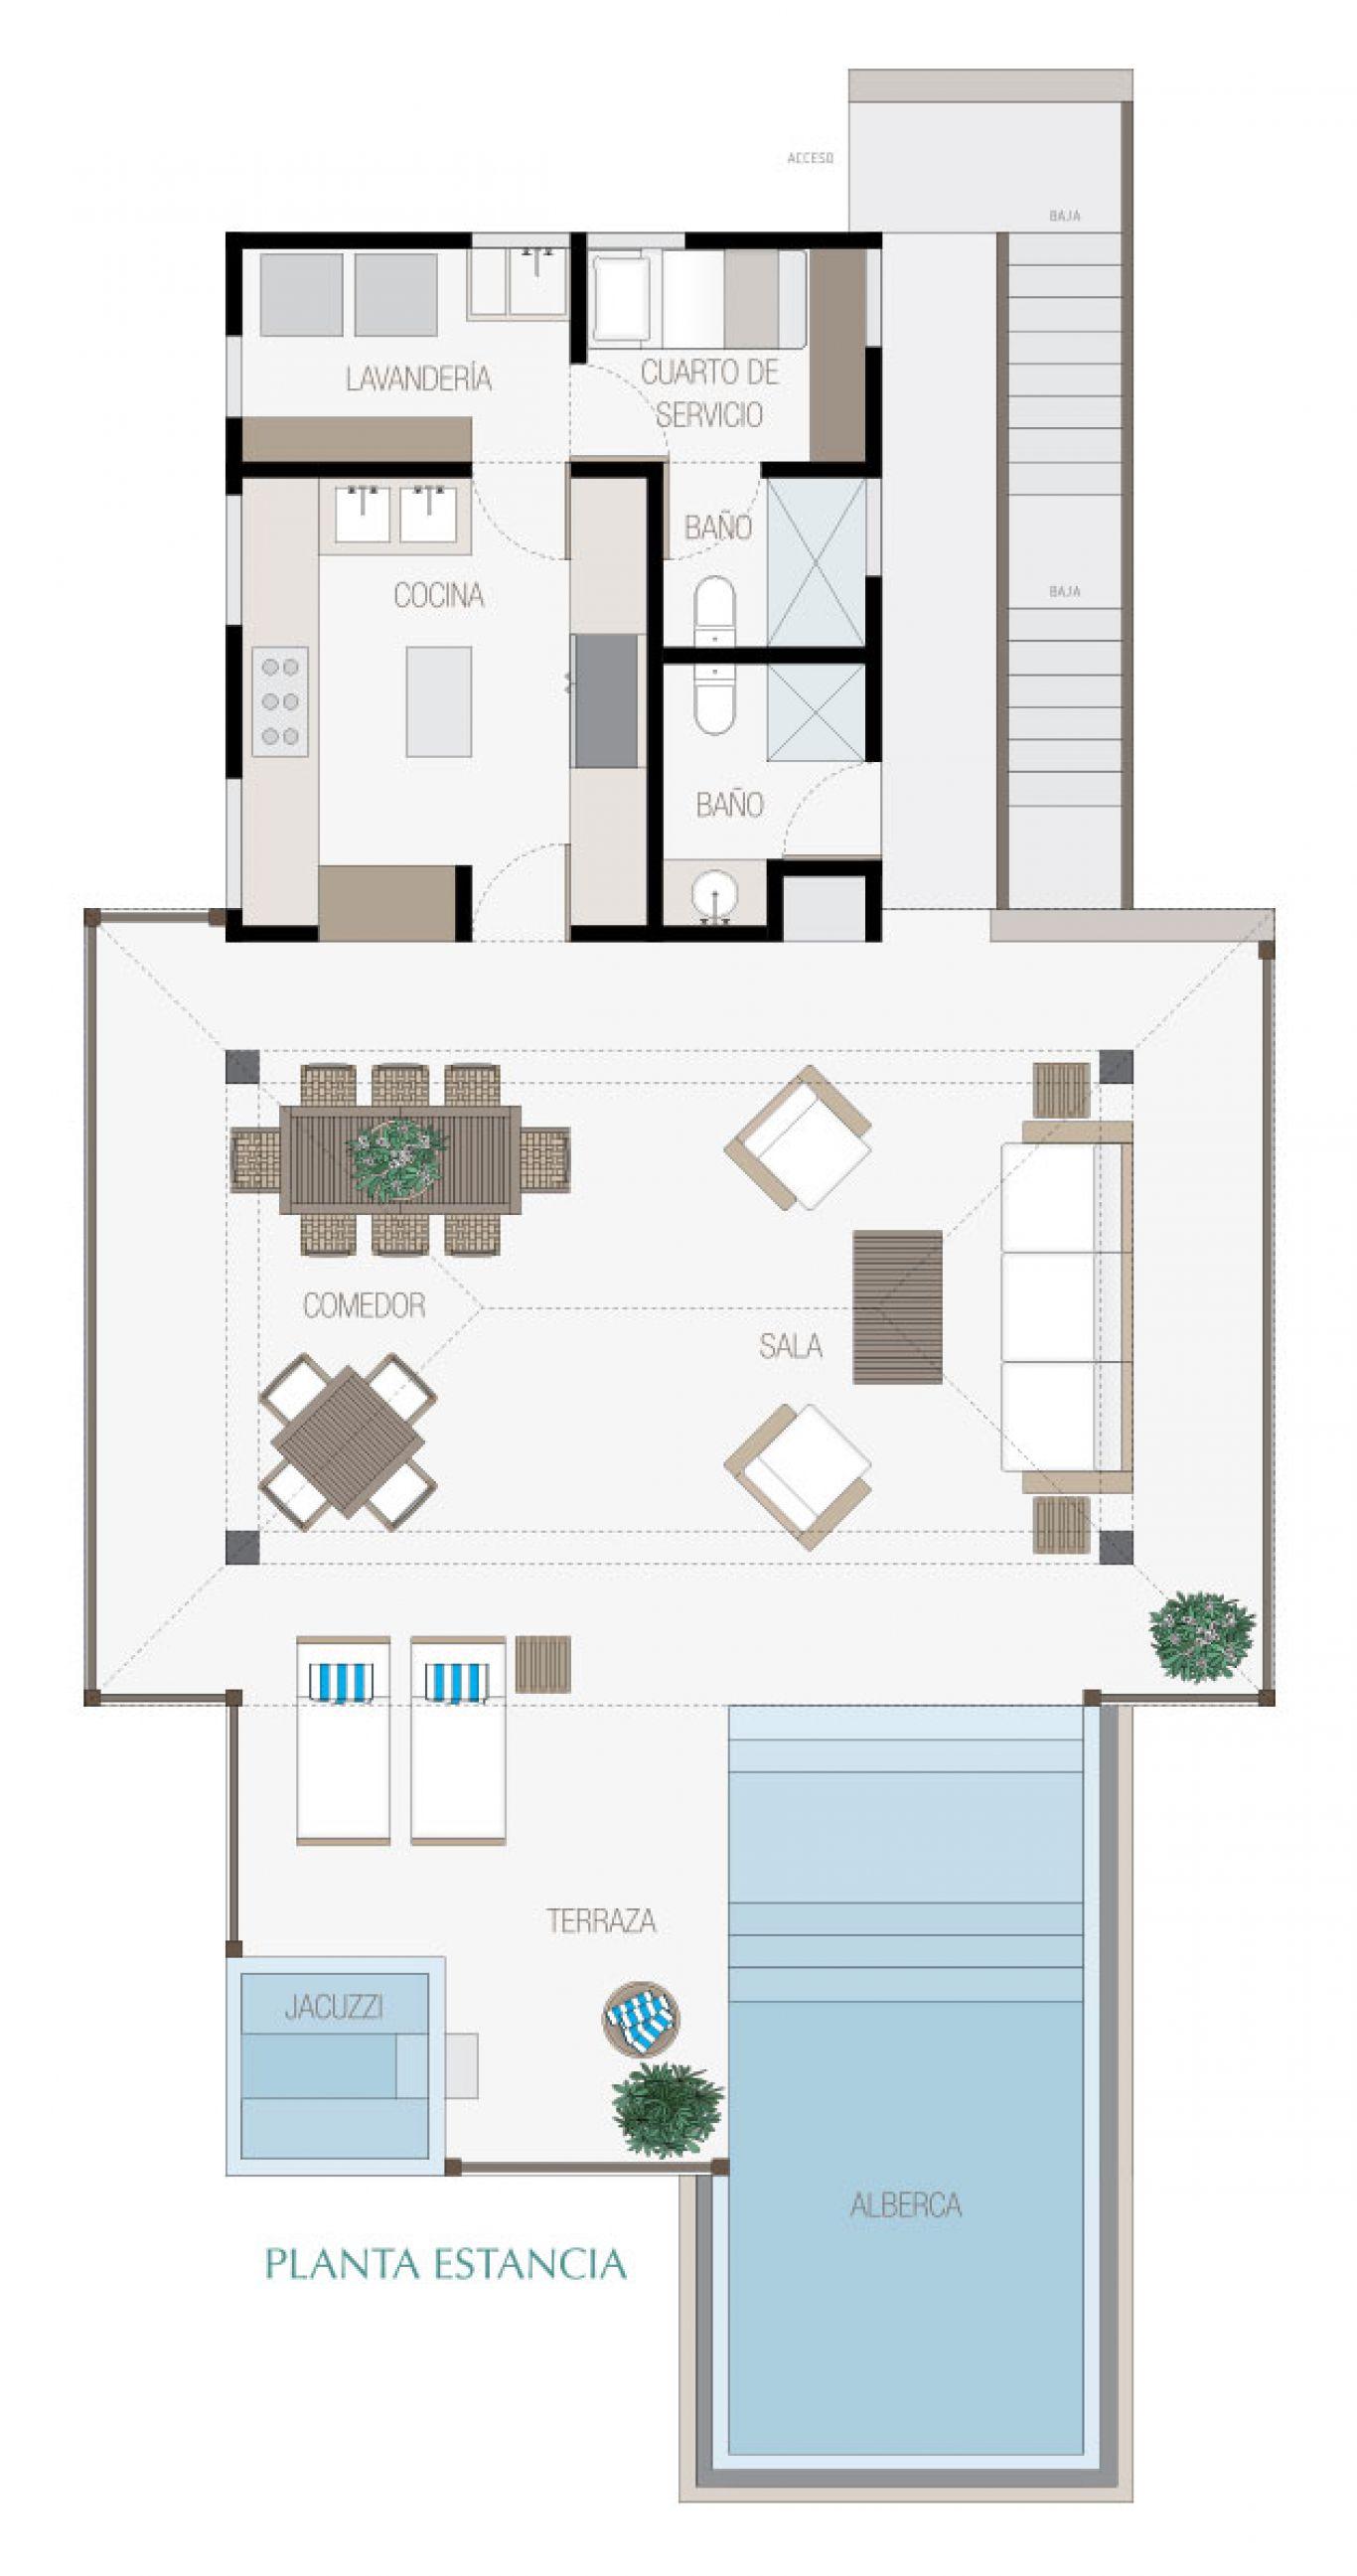 Manai, id 1519068, no 3, plano de villa 11, 298